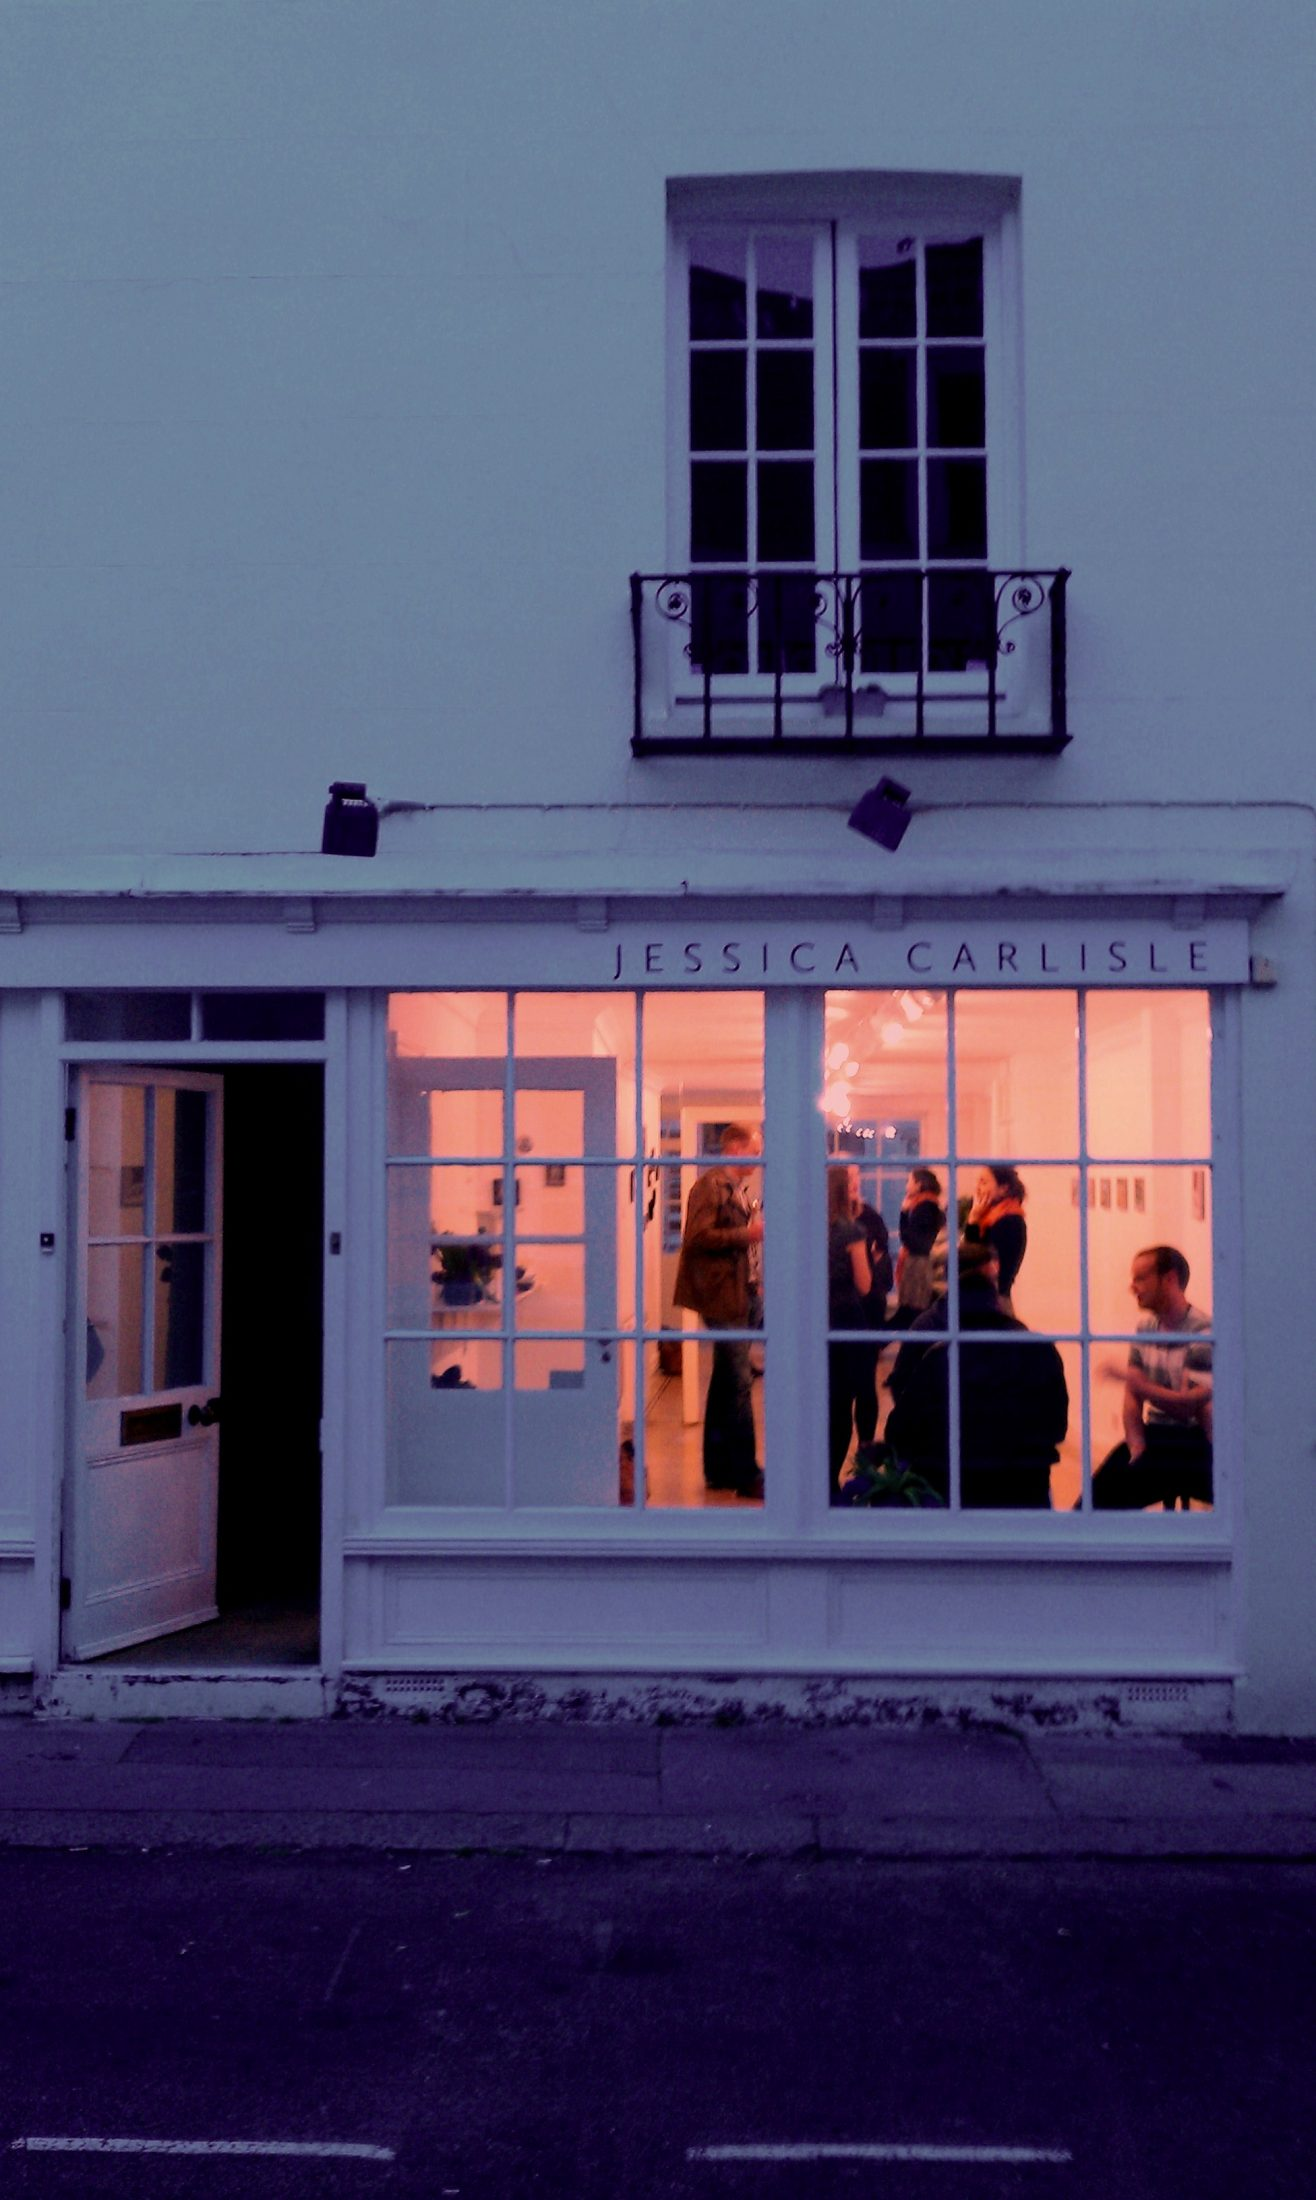 Hester Finch - Jessica Carlisle Gallery